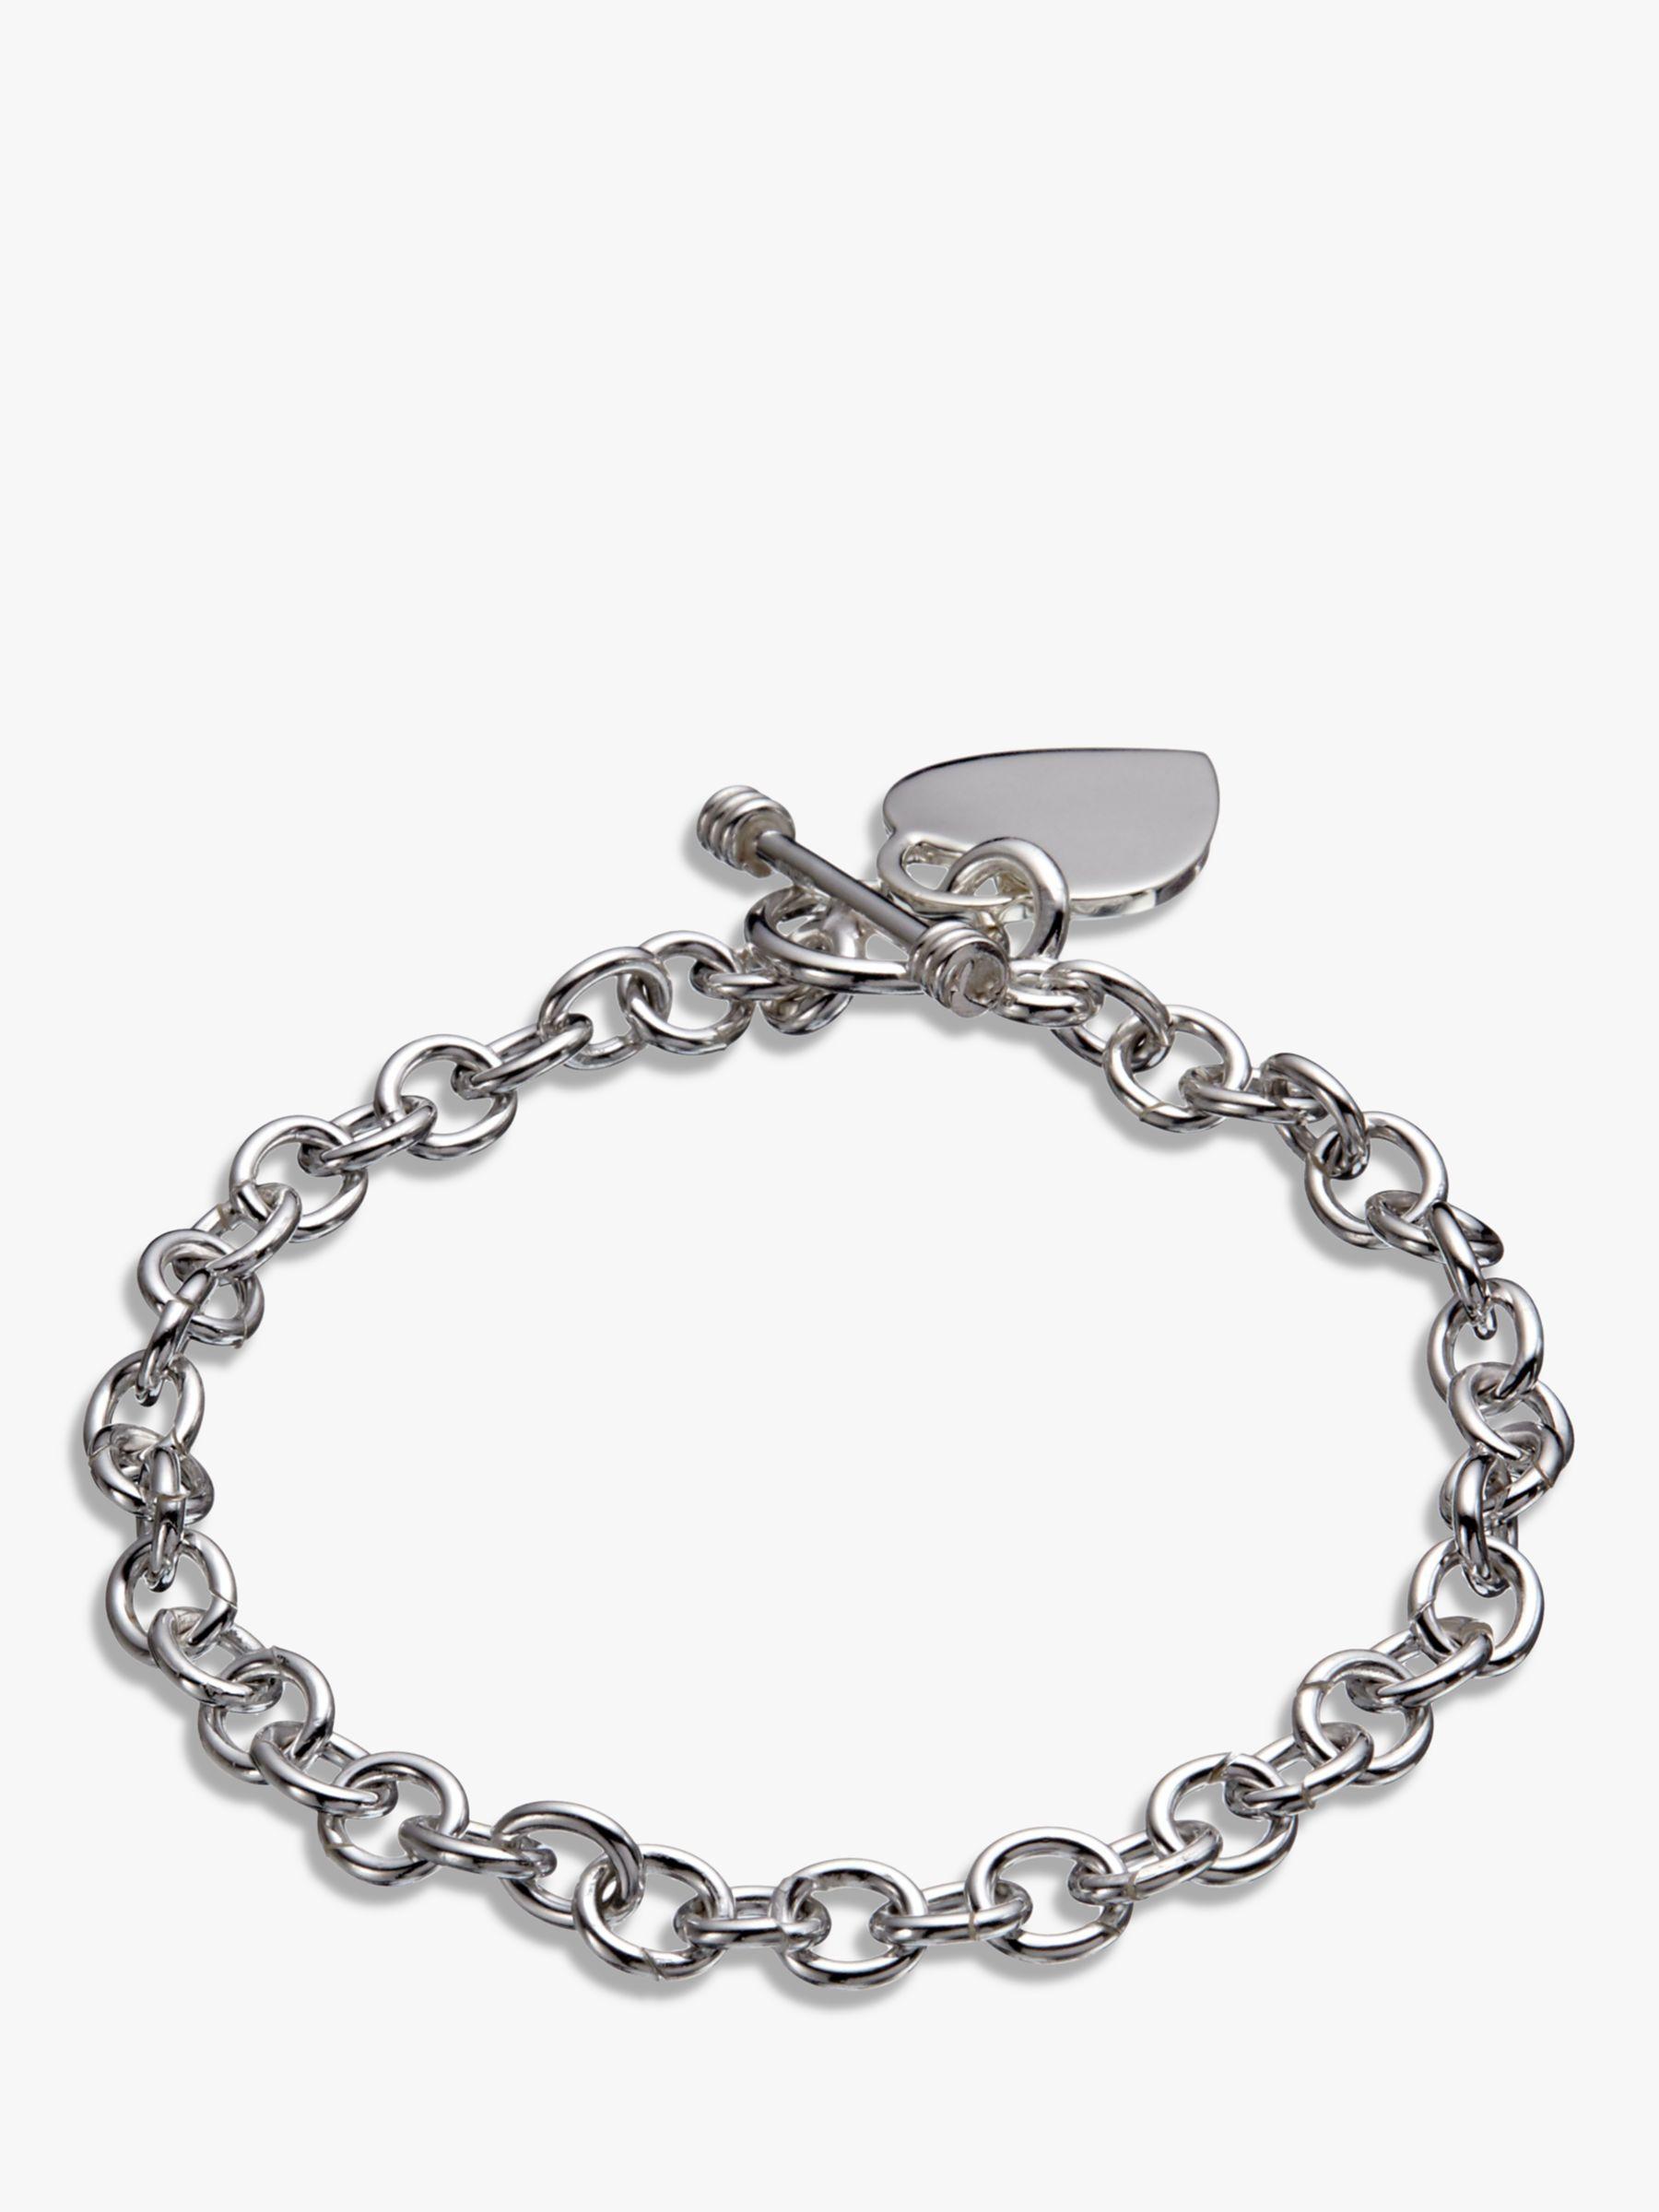 Andea Andea Sterling Silver Oval Link Heart Charm Bracelet, Silver